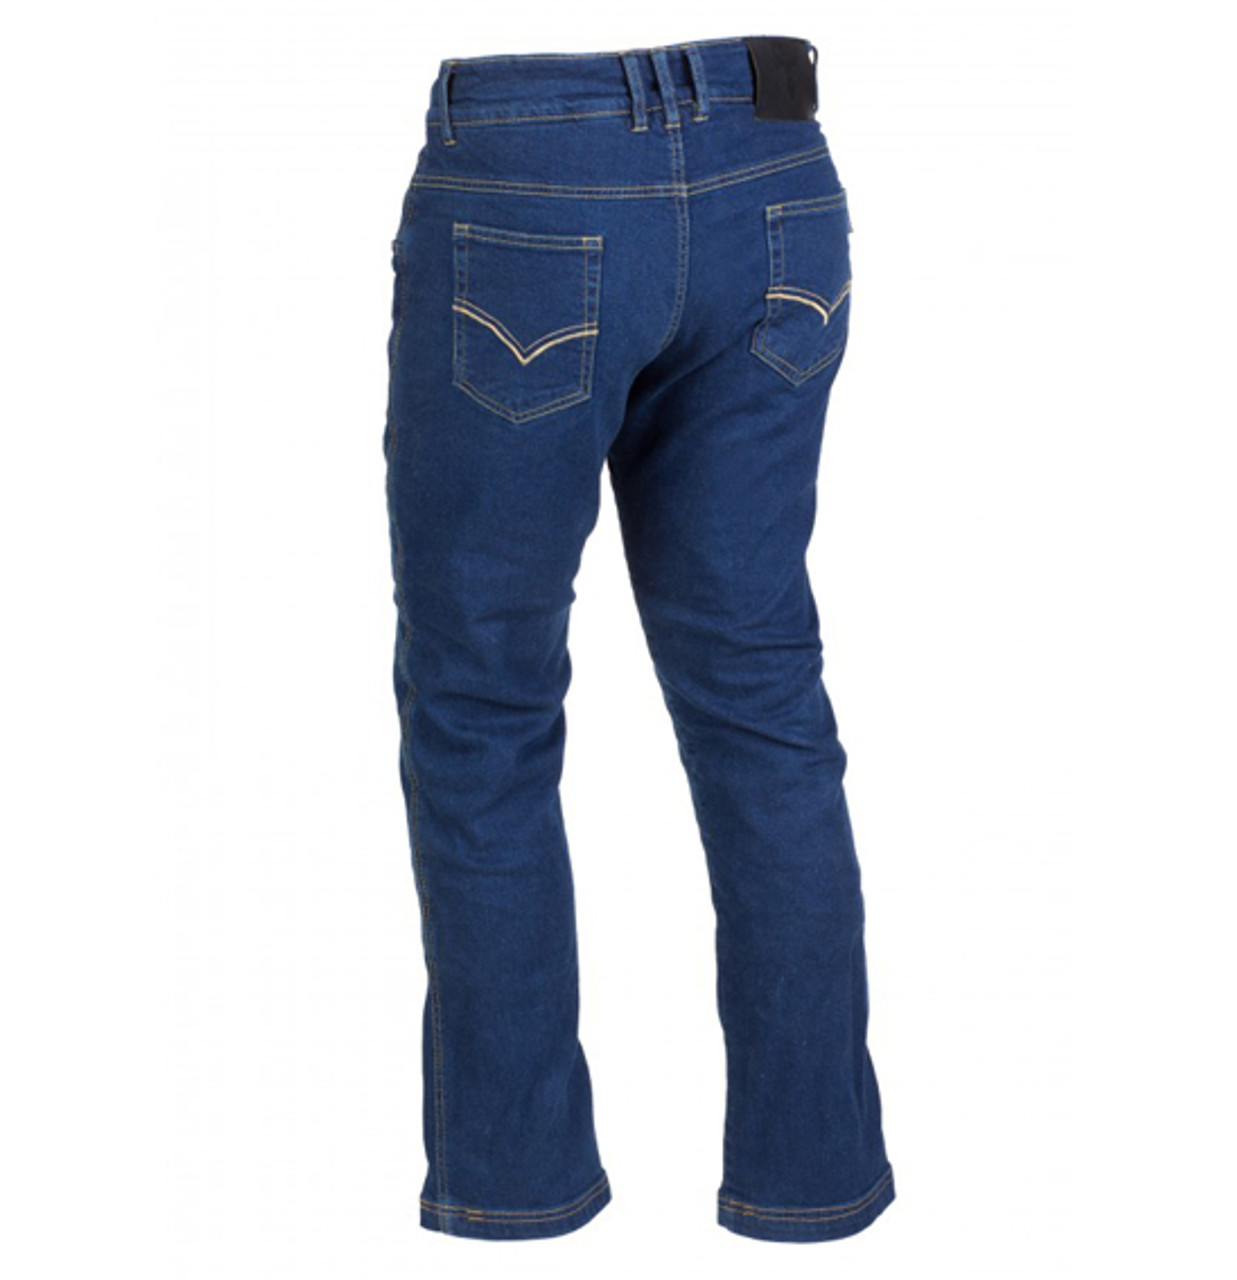 Bull-It SR6 Bondi Motorcycle Riding Jeans - LADIES, Regular Leg Length - Clearance Sale!